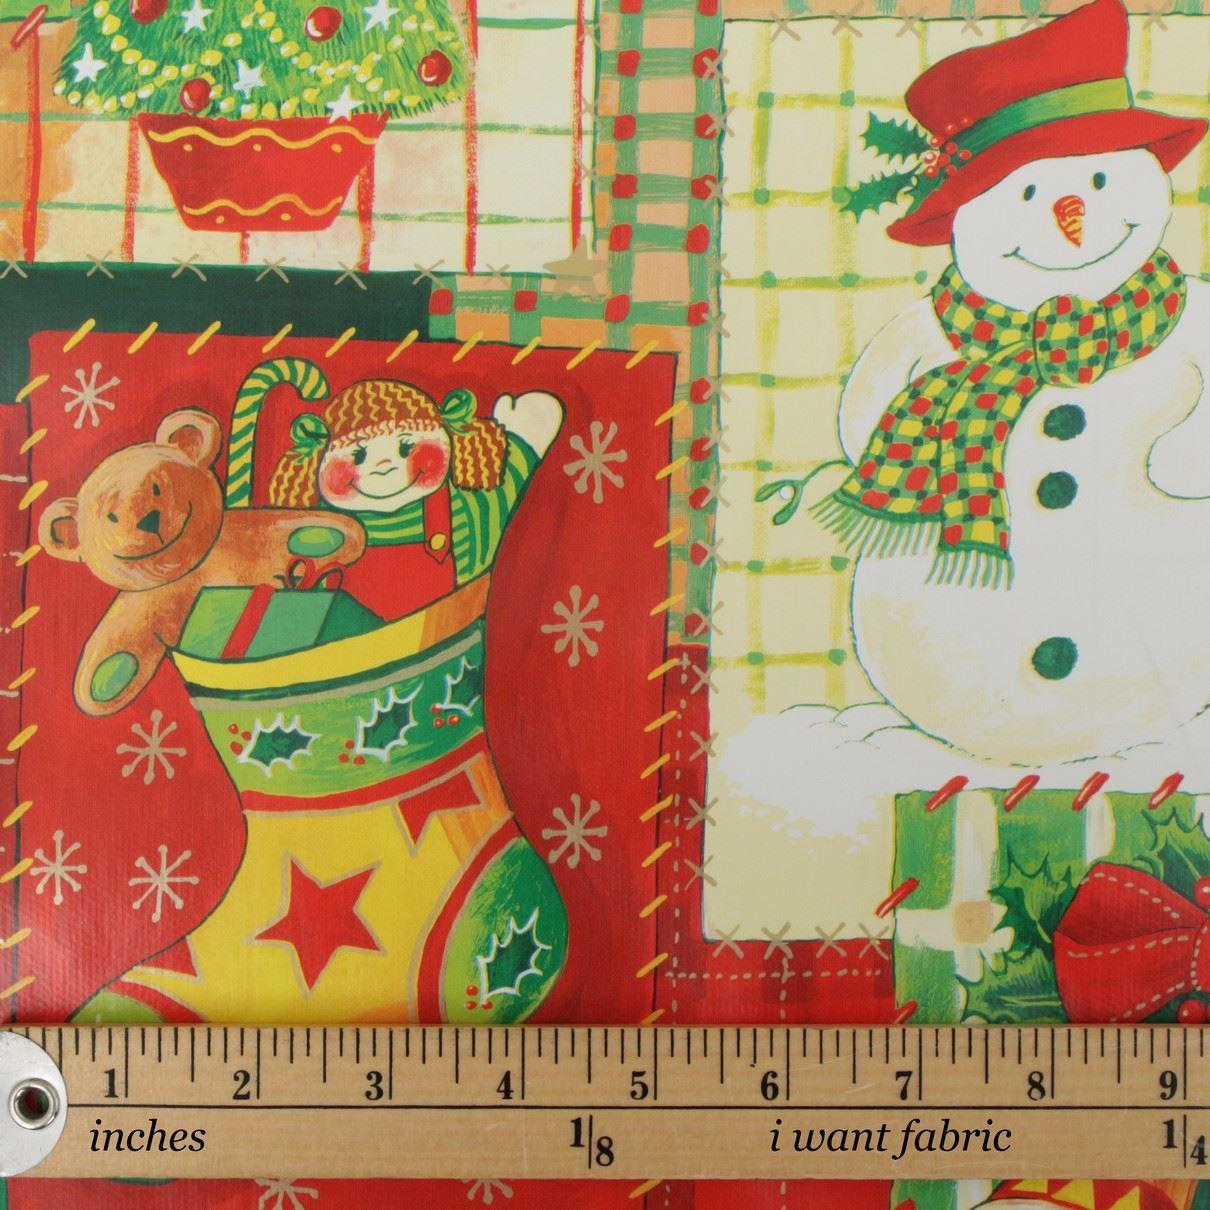 thumbnail 17 - CHRISTMAS PVC OILCLOTH VINYL FABRIC XMAS KITCHEN TABLE WIPECLEAN TABLECLOTHS